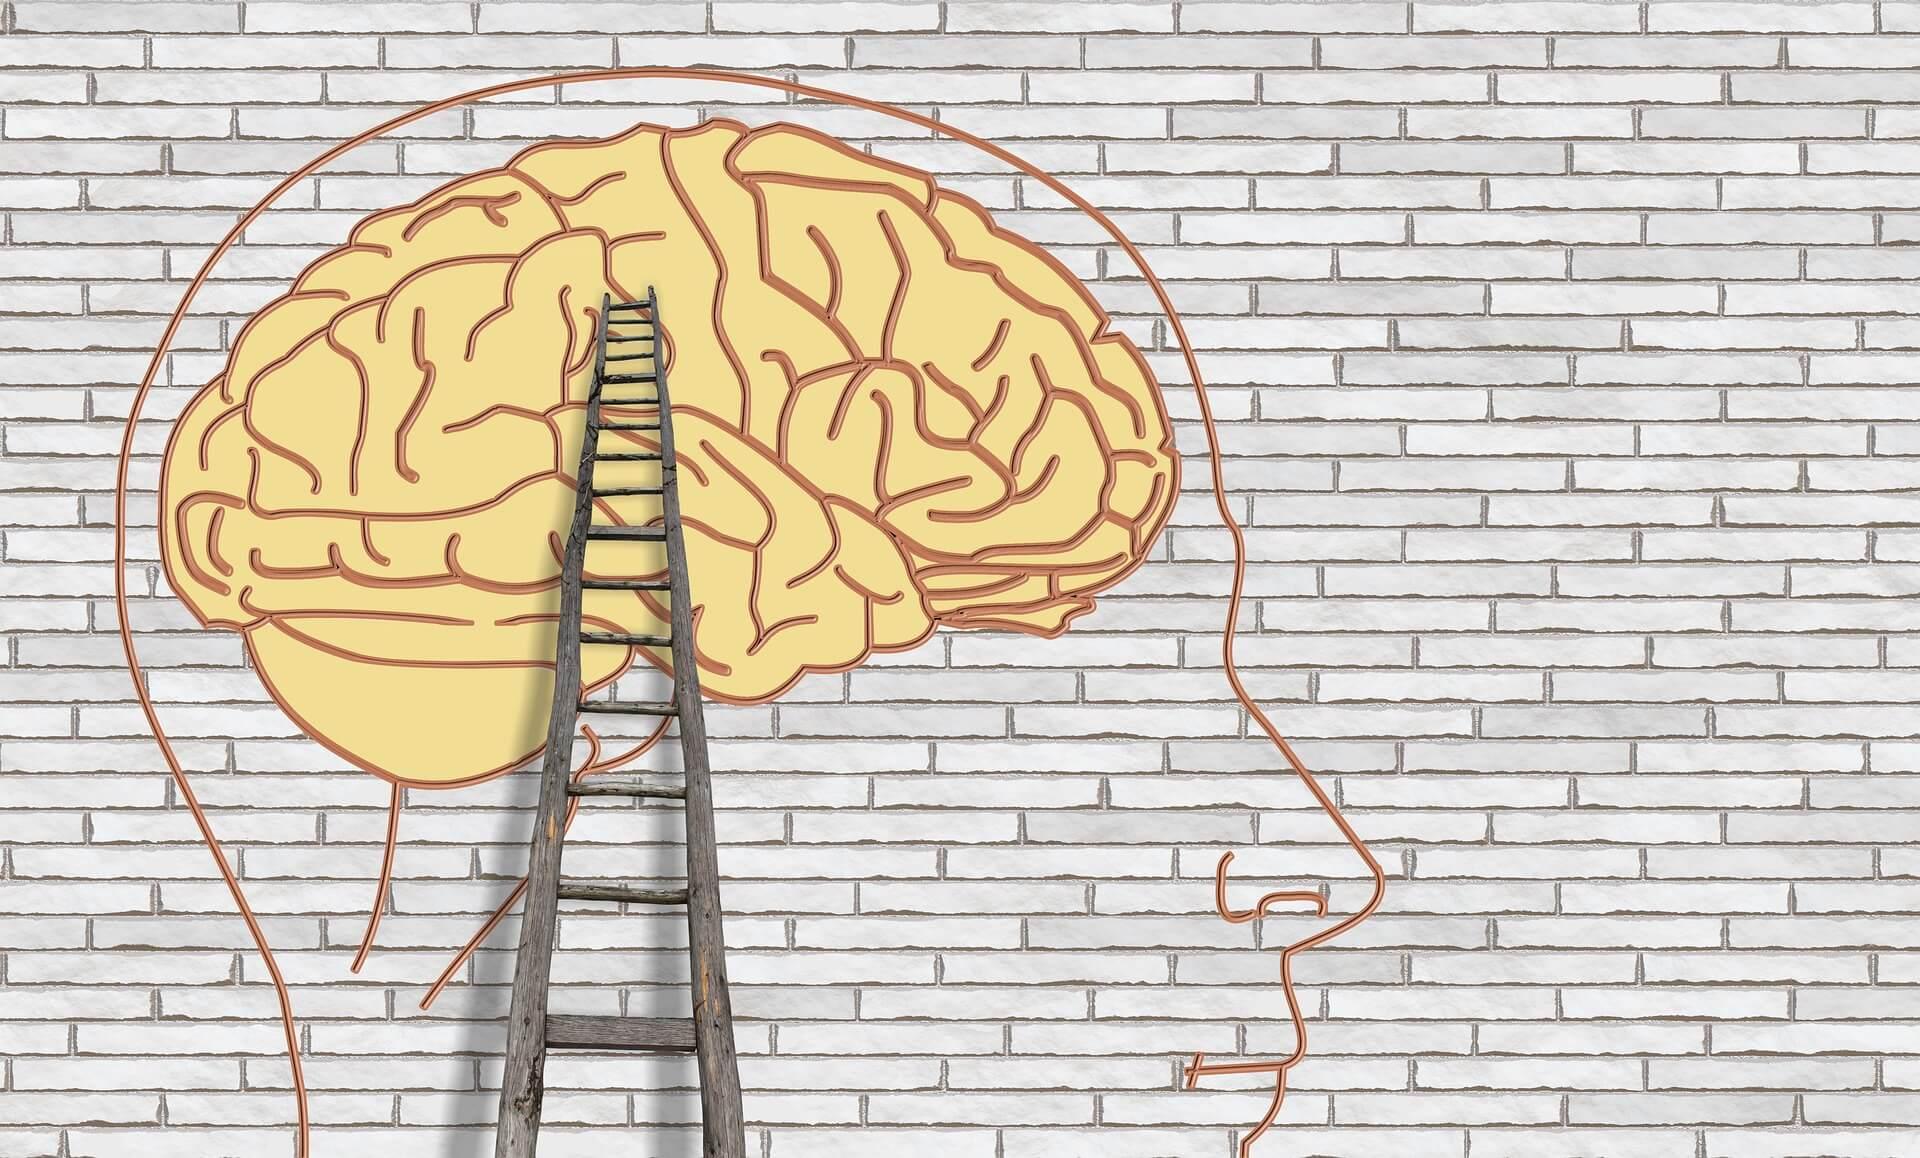 creier-schimbare-tipare-obiceiuri-resetare